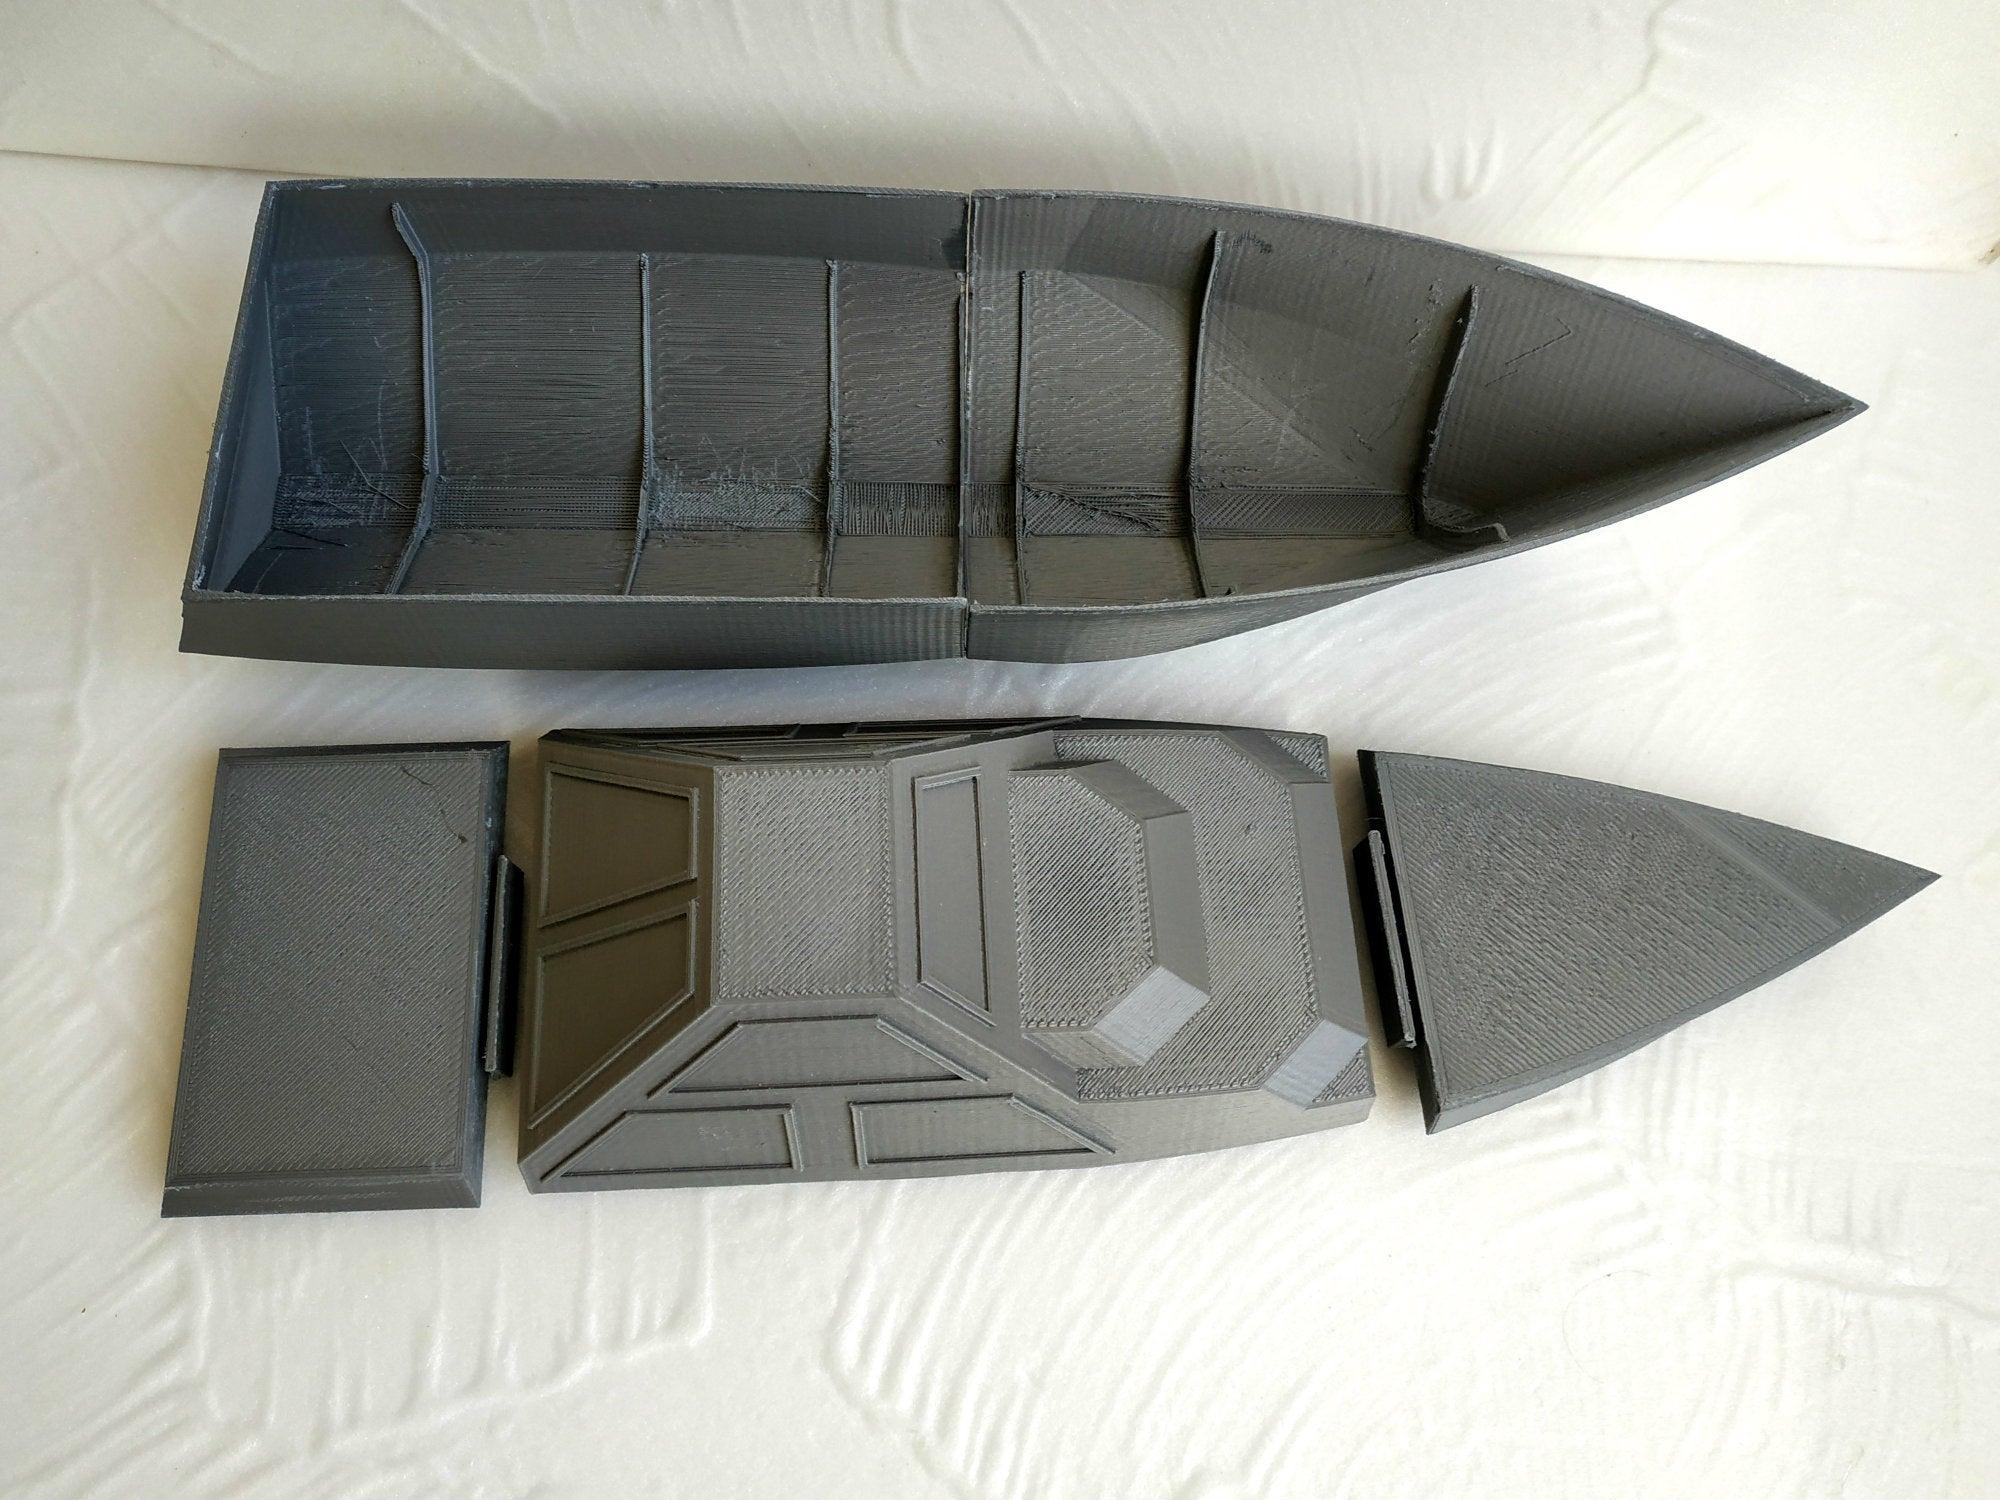 DARINS_6_1.jpg Download free STL file DARINS - stealth boat with reactionless propulsion drive • 3D printer design, TanyaAkinora